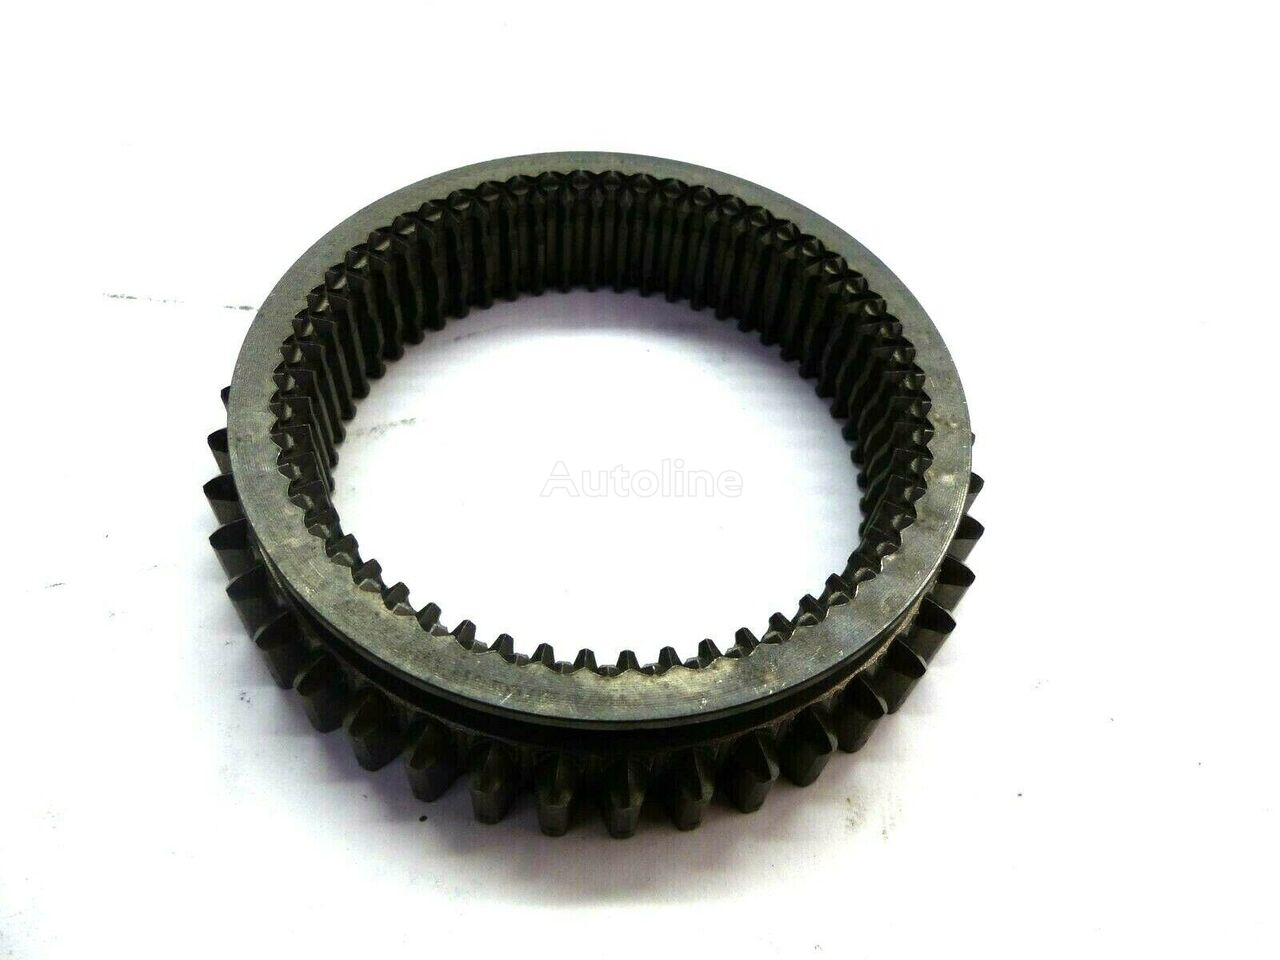 FIAT Original Getriebe-Zahnrad (71753297) gearbox for truck